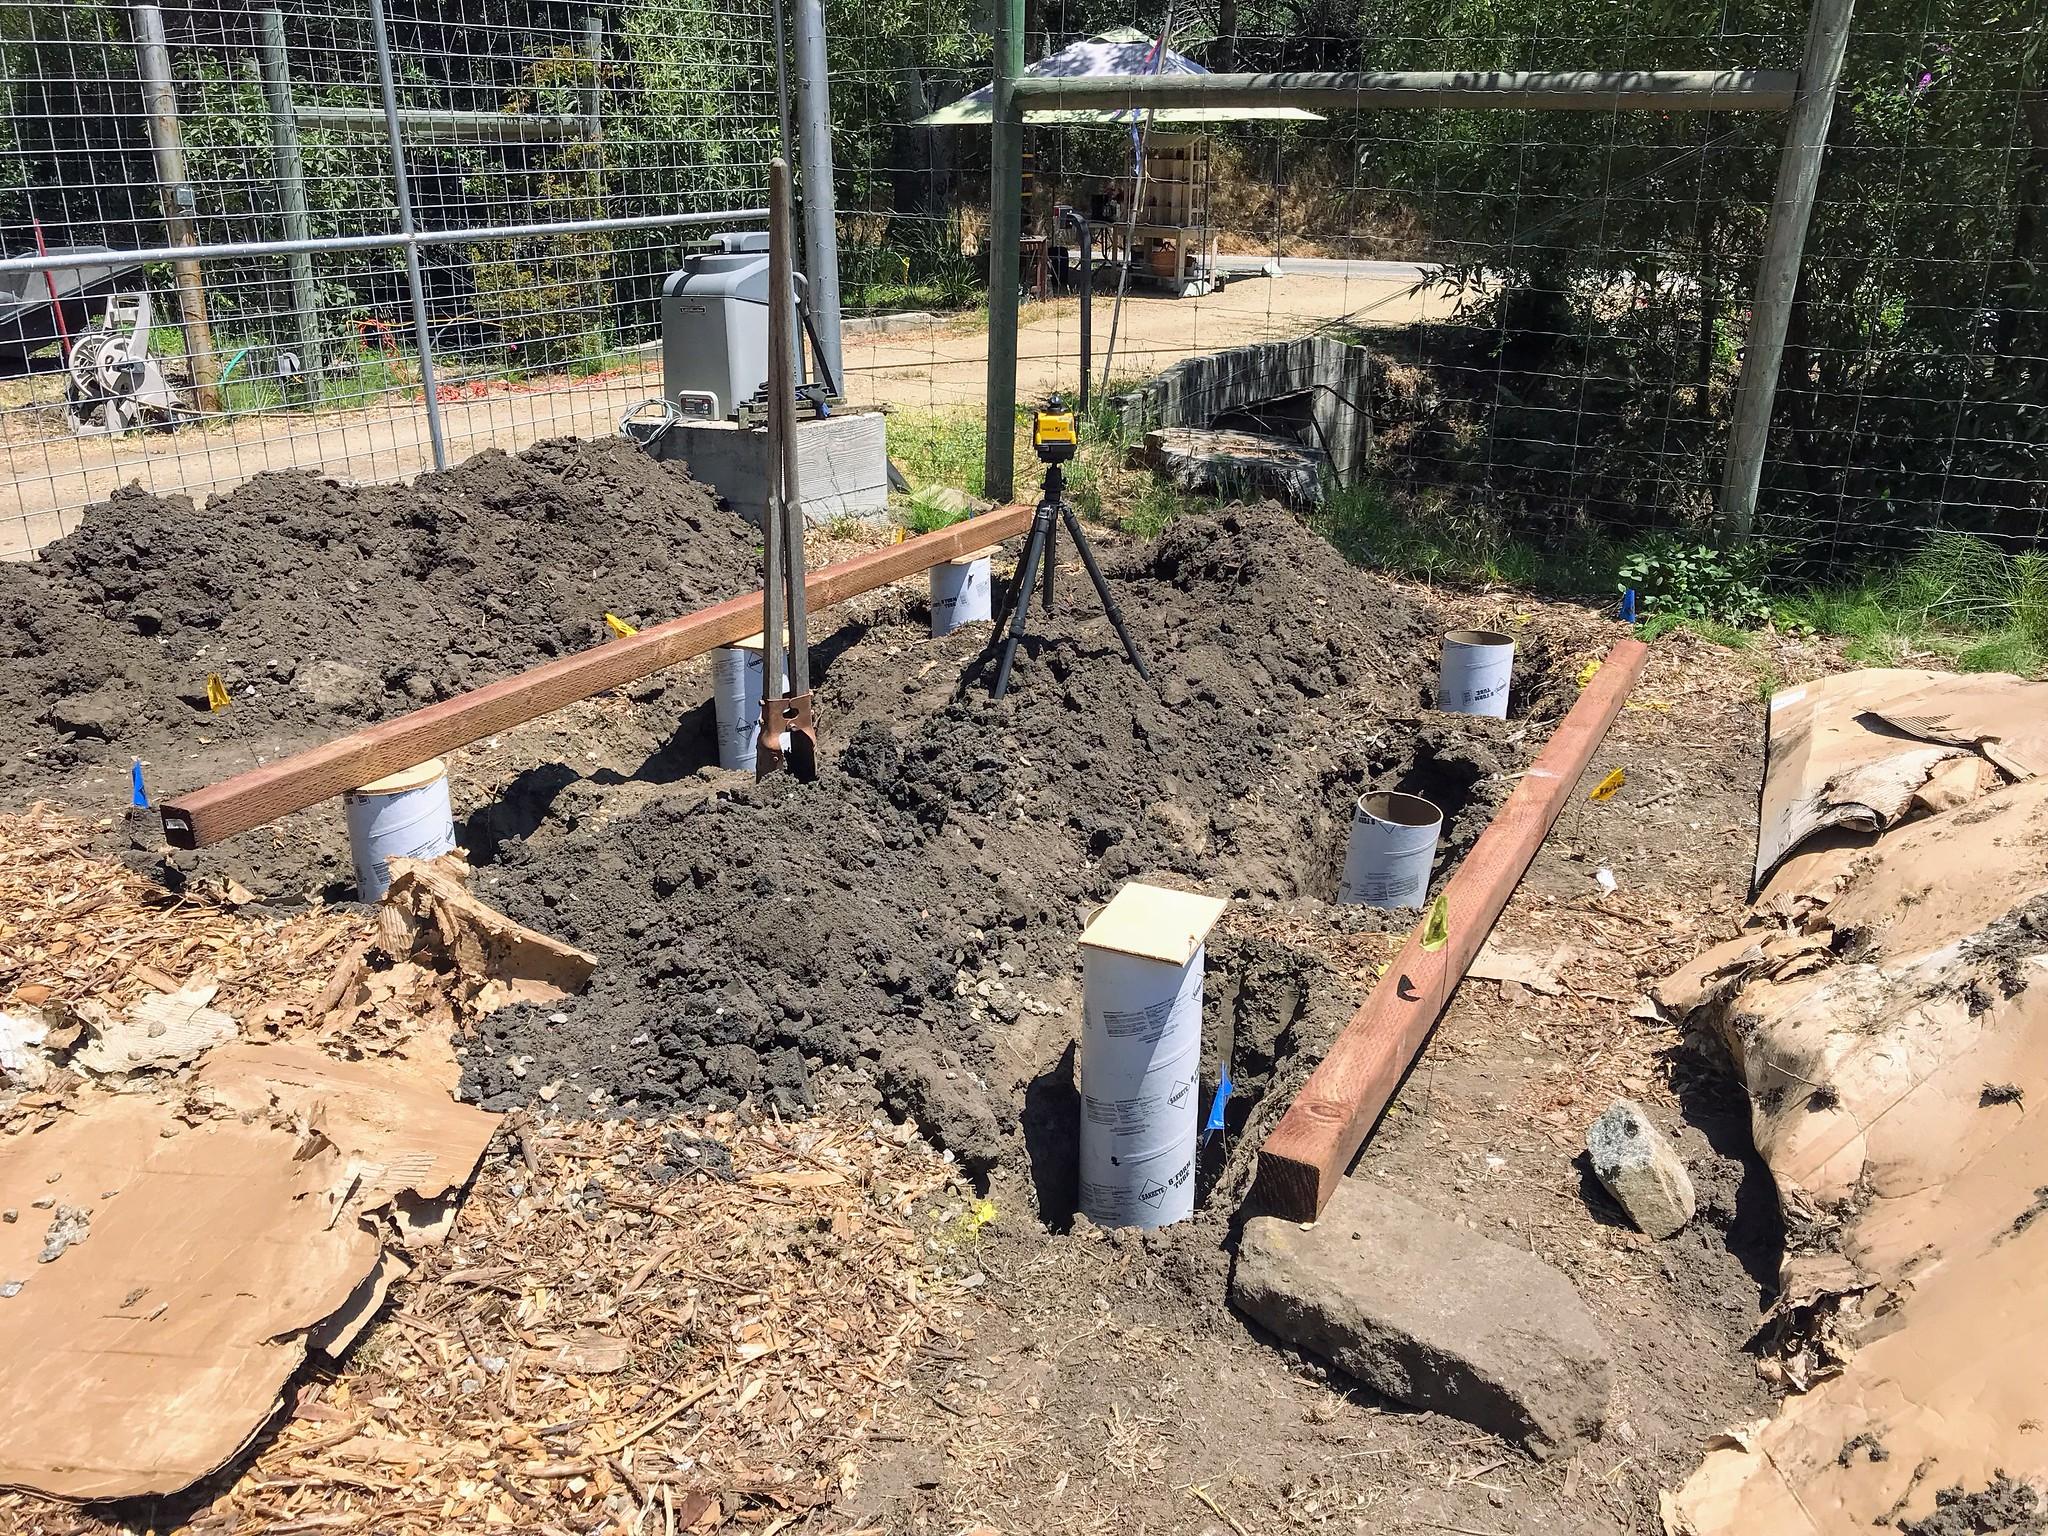 Holes dug